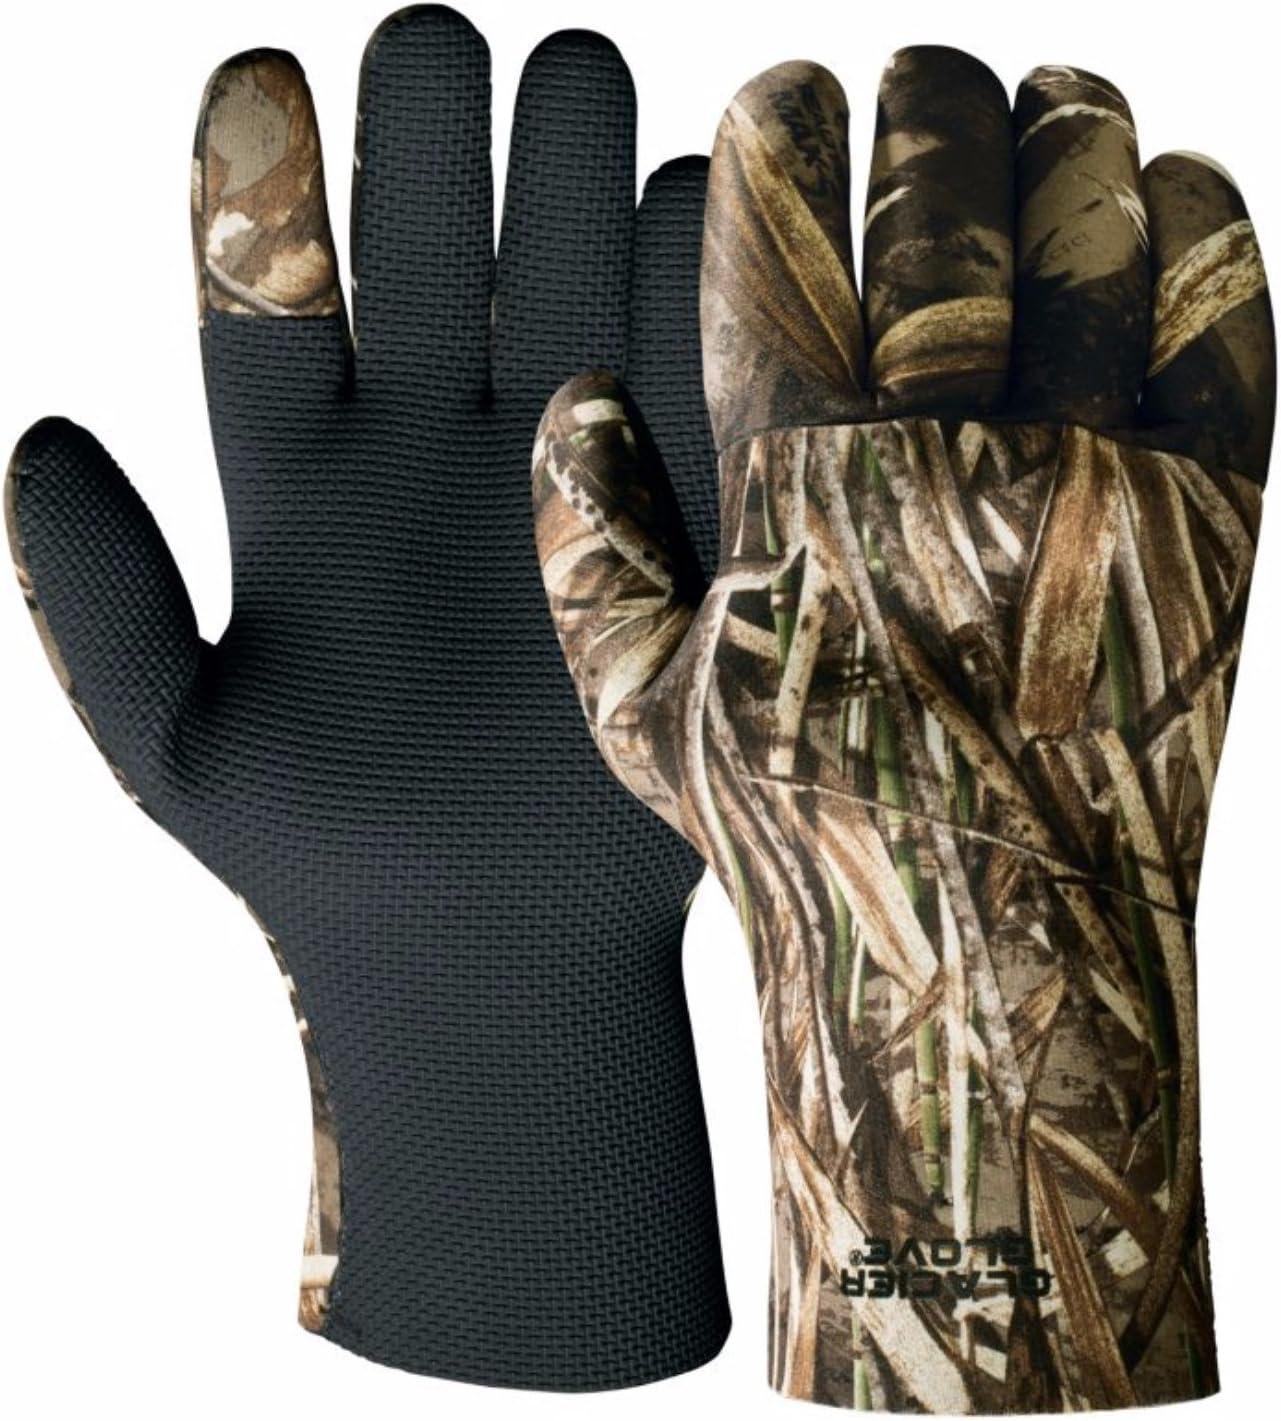 Amazon.com : Glacier Glove Aleutian Full-Fingered Neoprene Fleece Lined Glove : Fishing Gloves : Sports & Outdoors